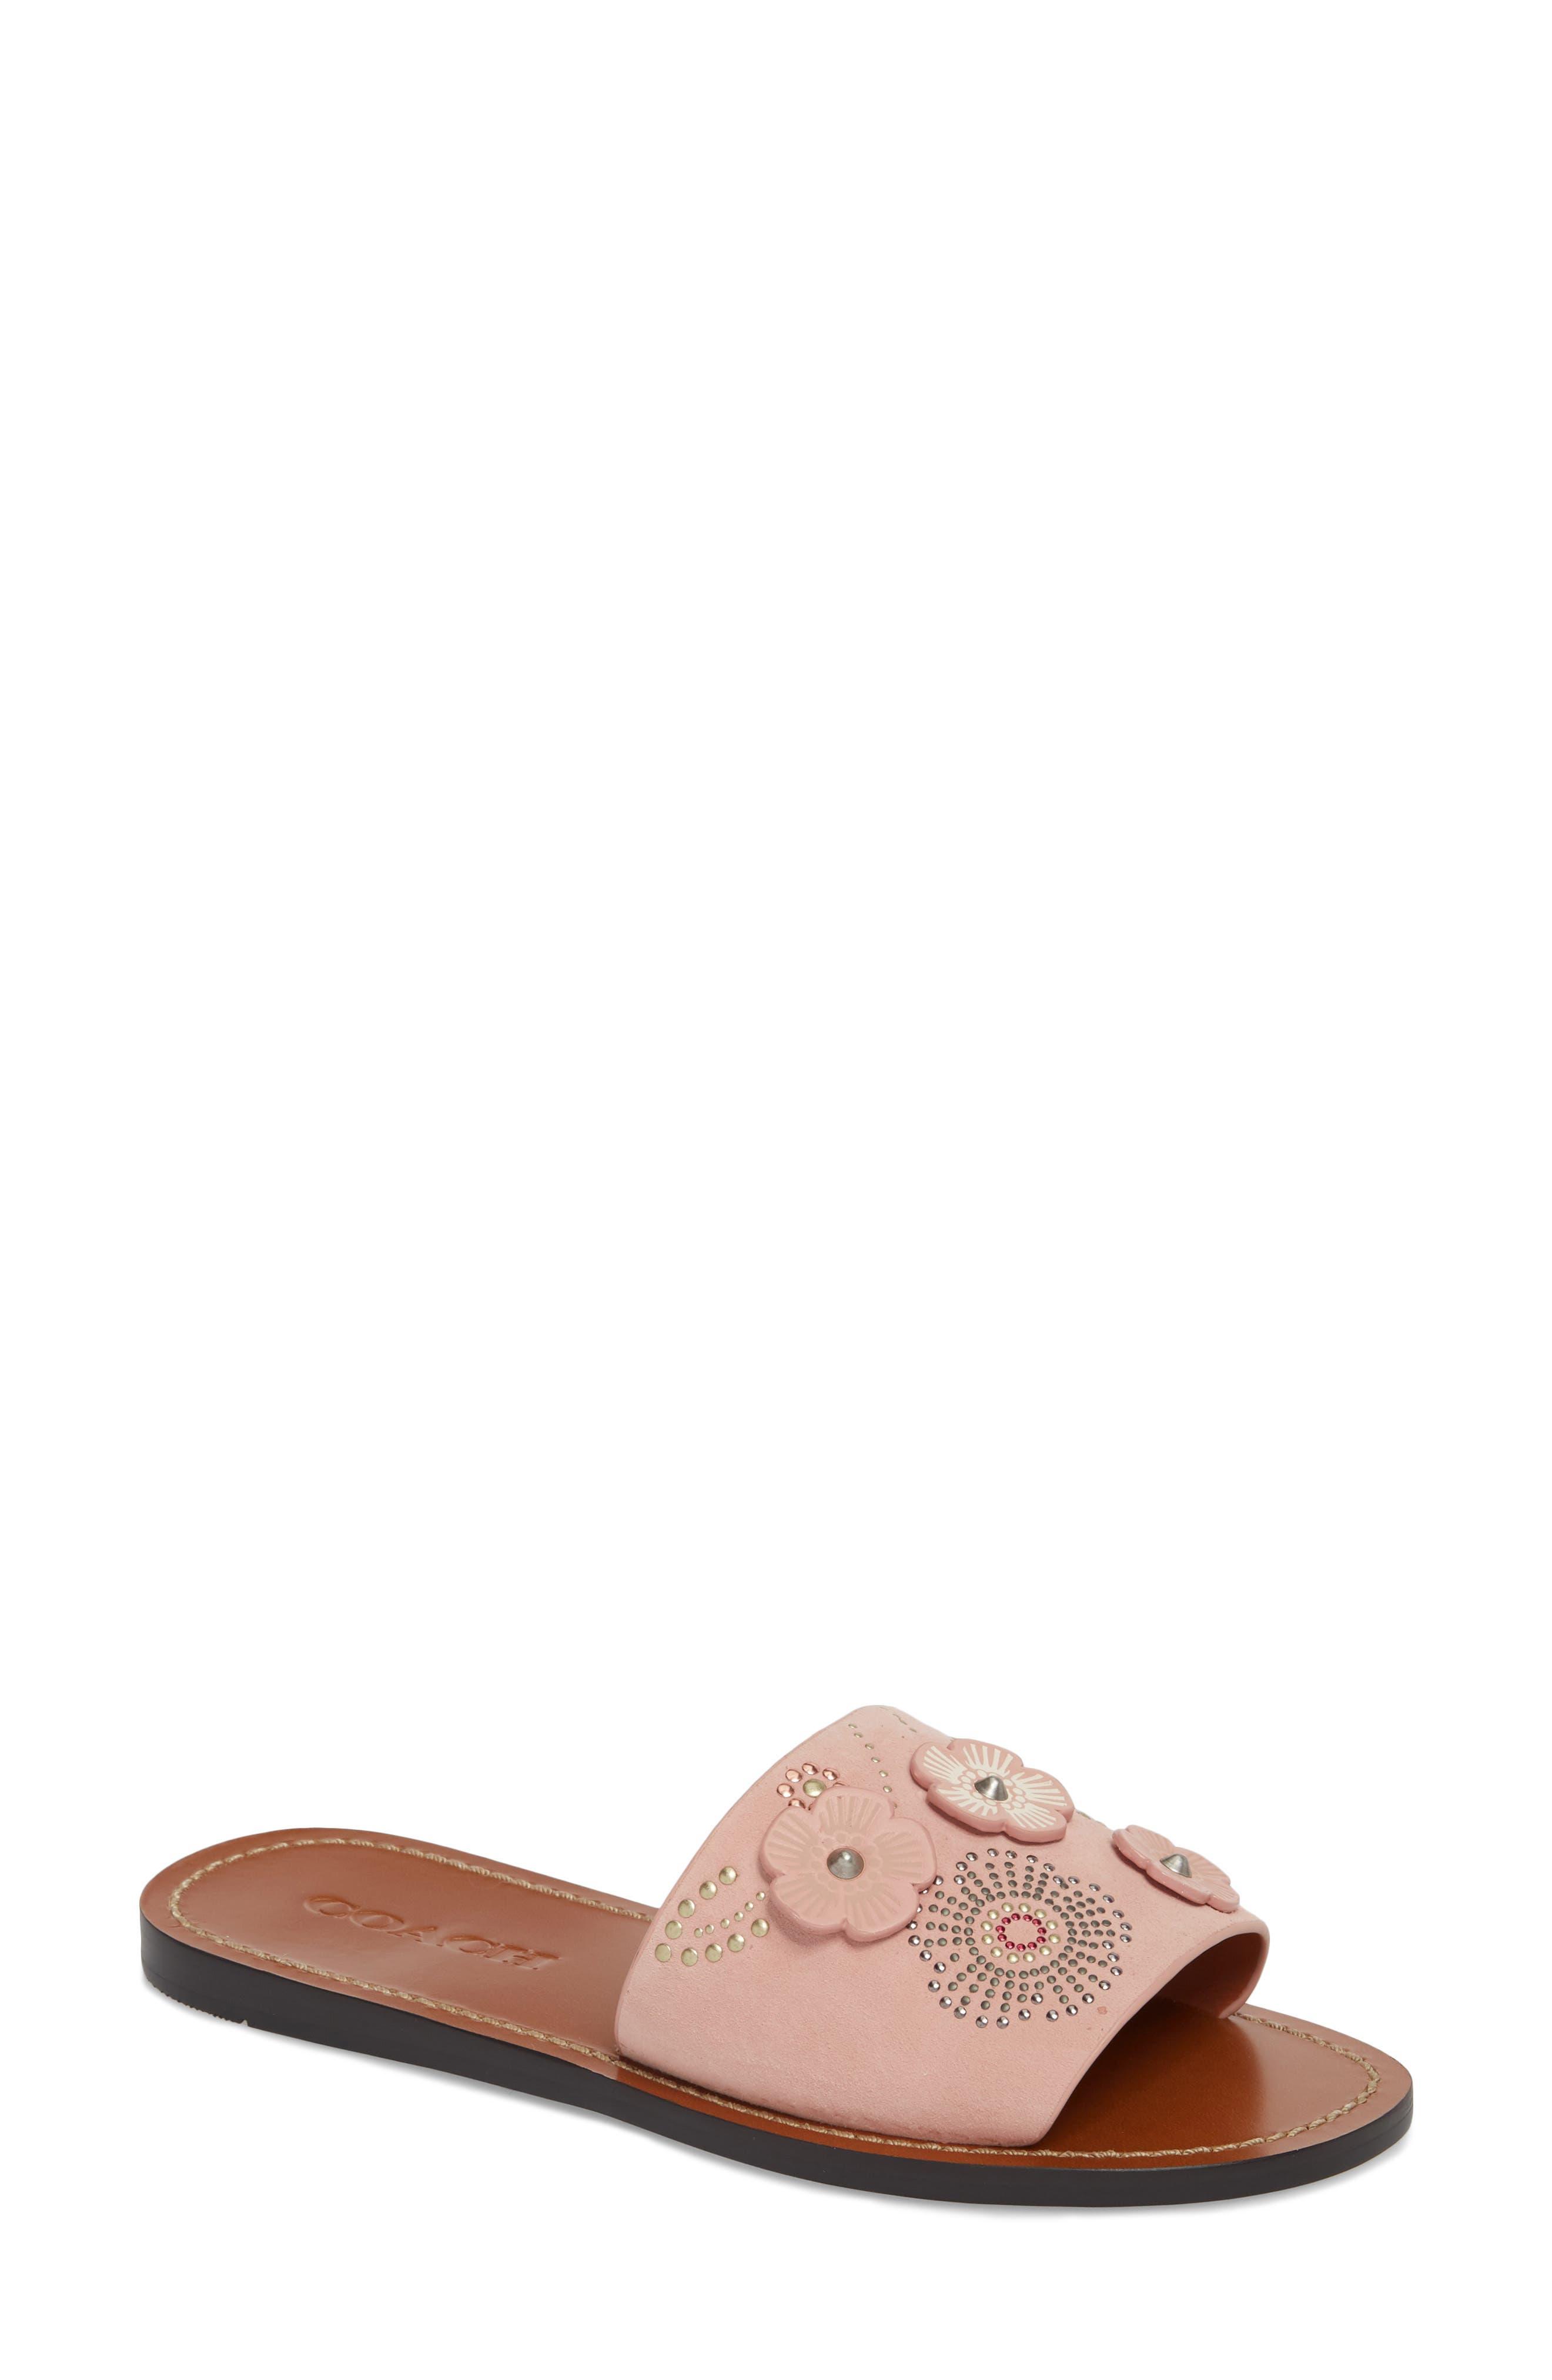 COACH Tea Rose Slide Sandal (Women)